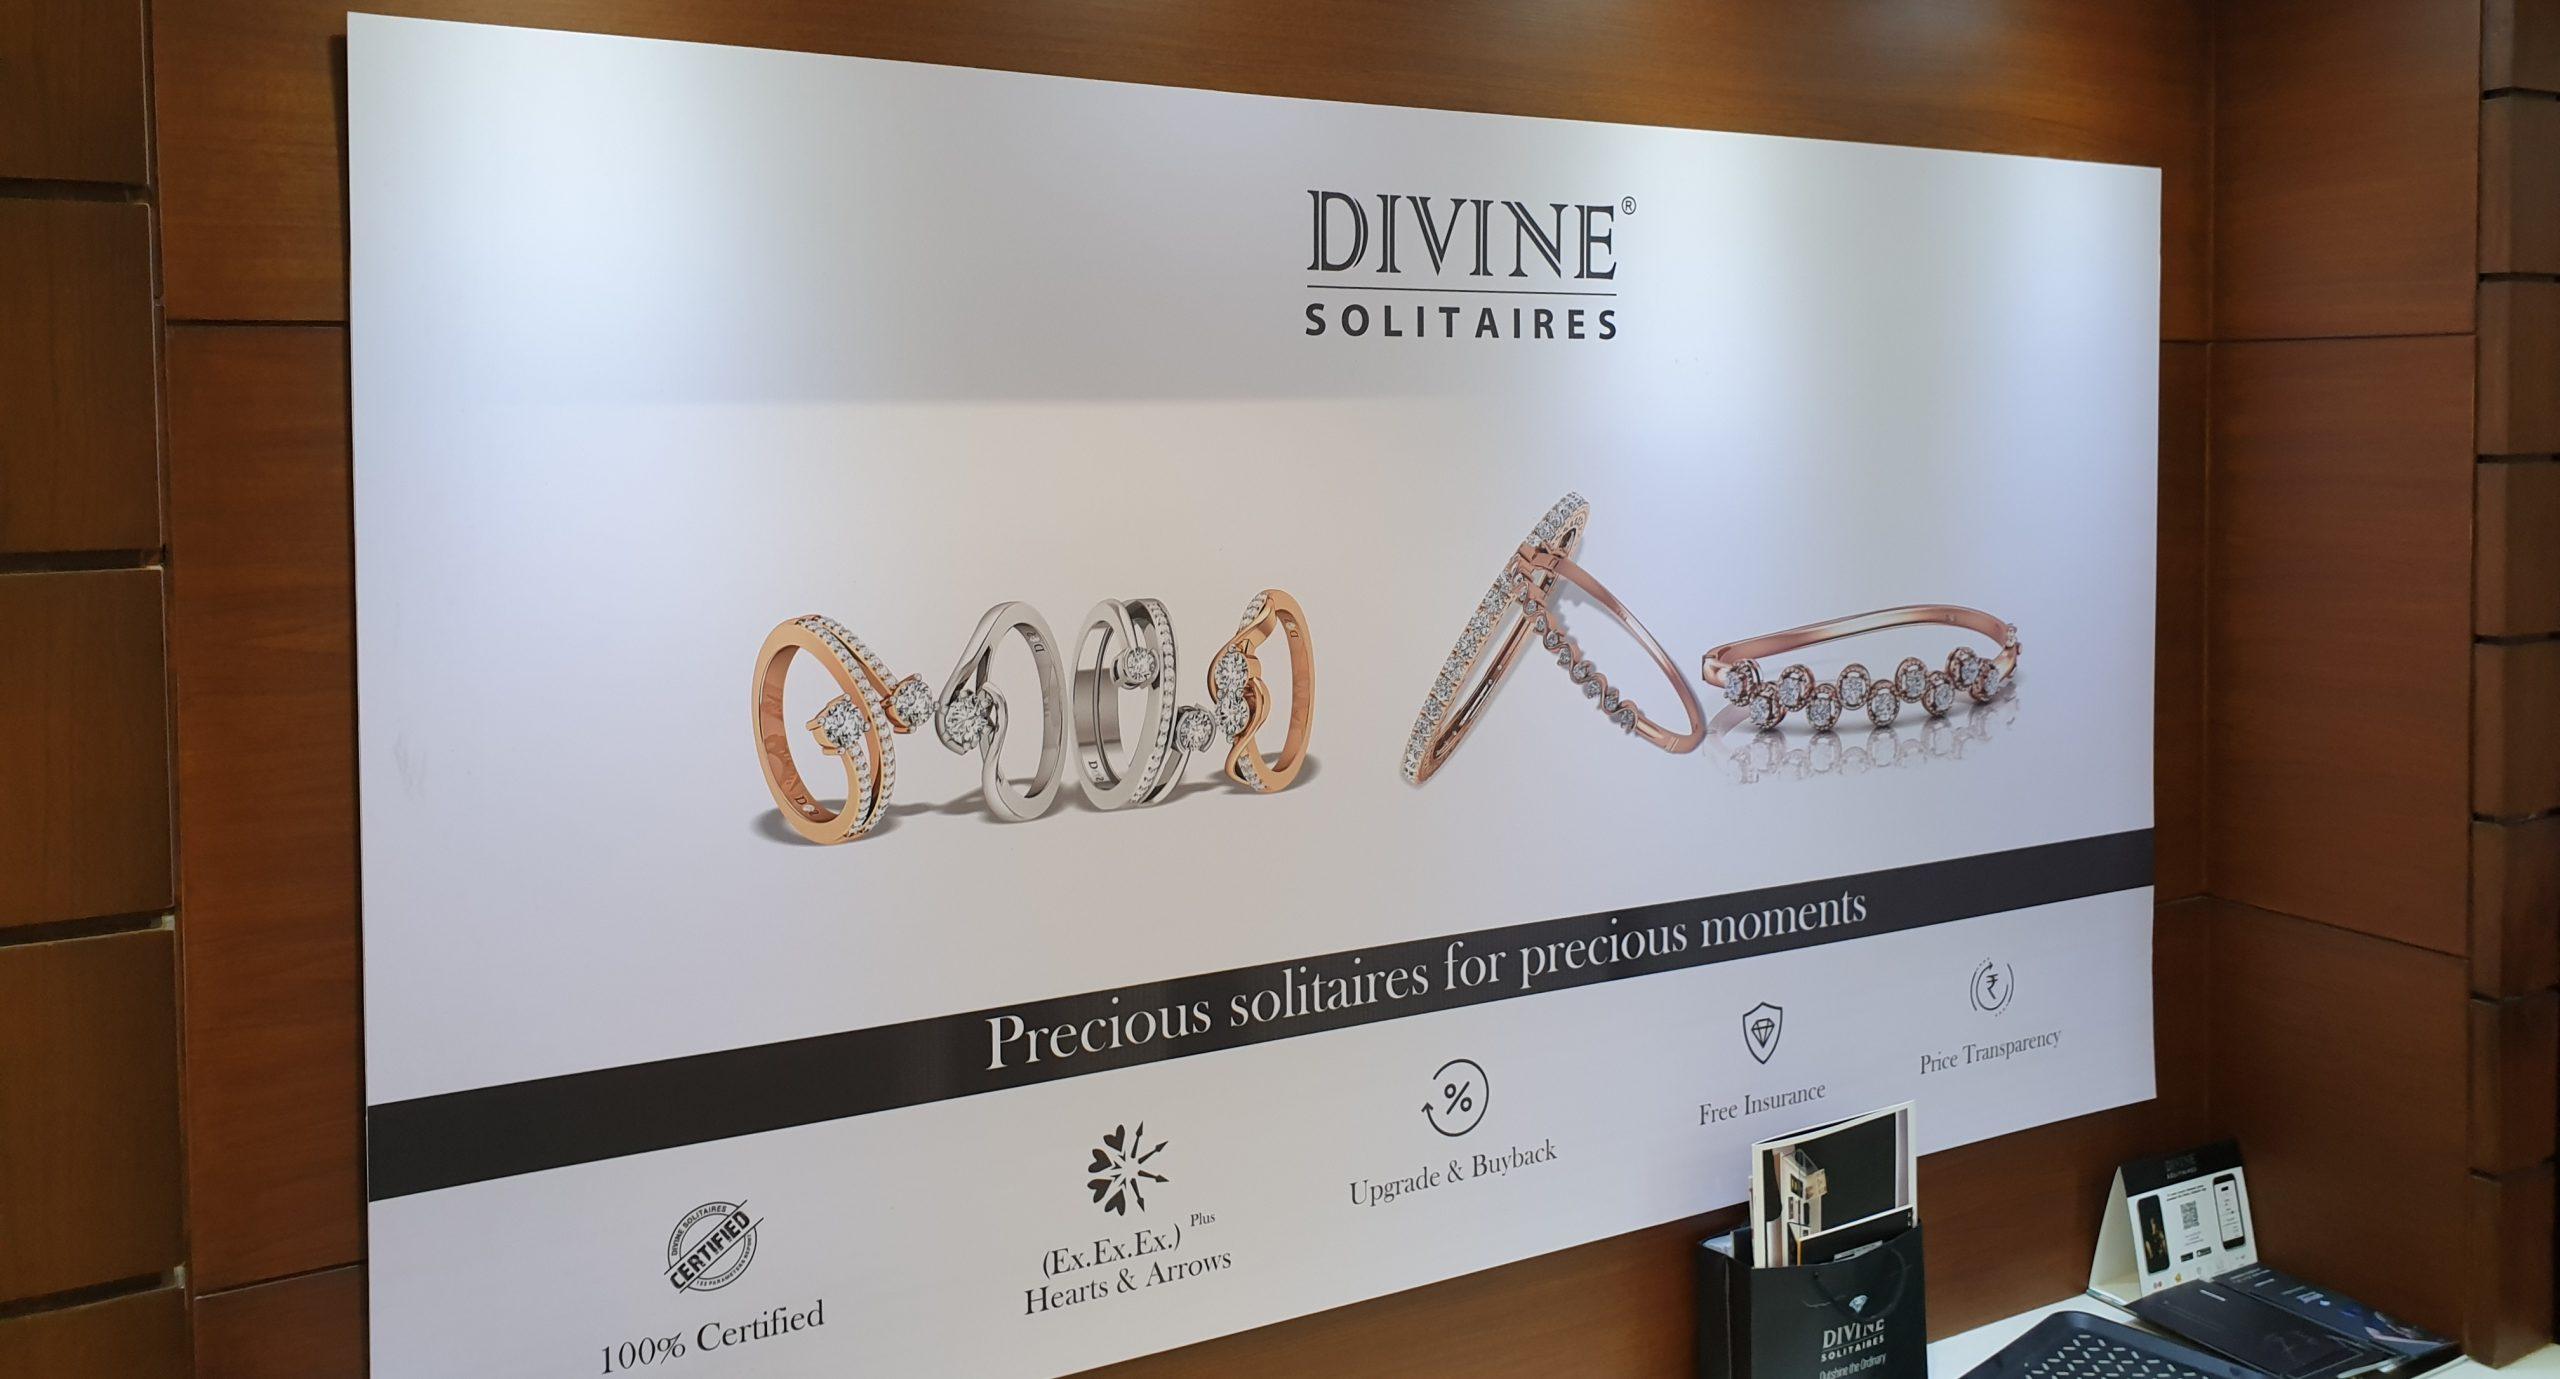 Divine Solitaires